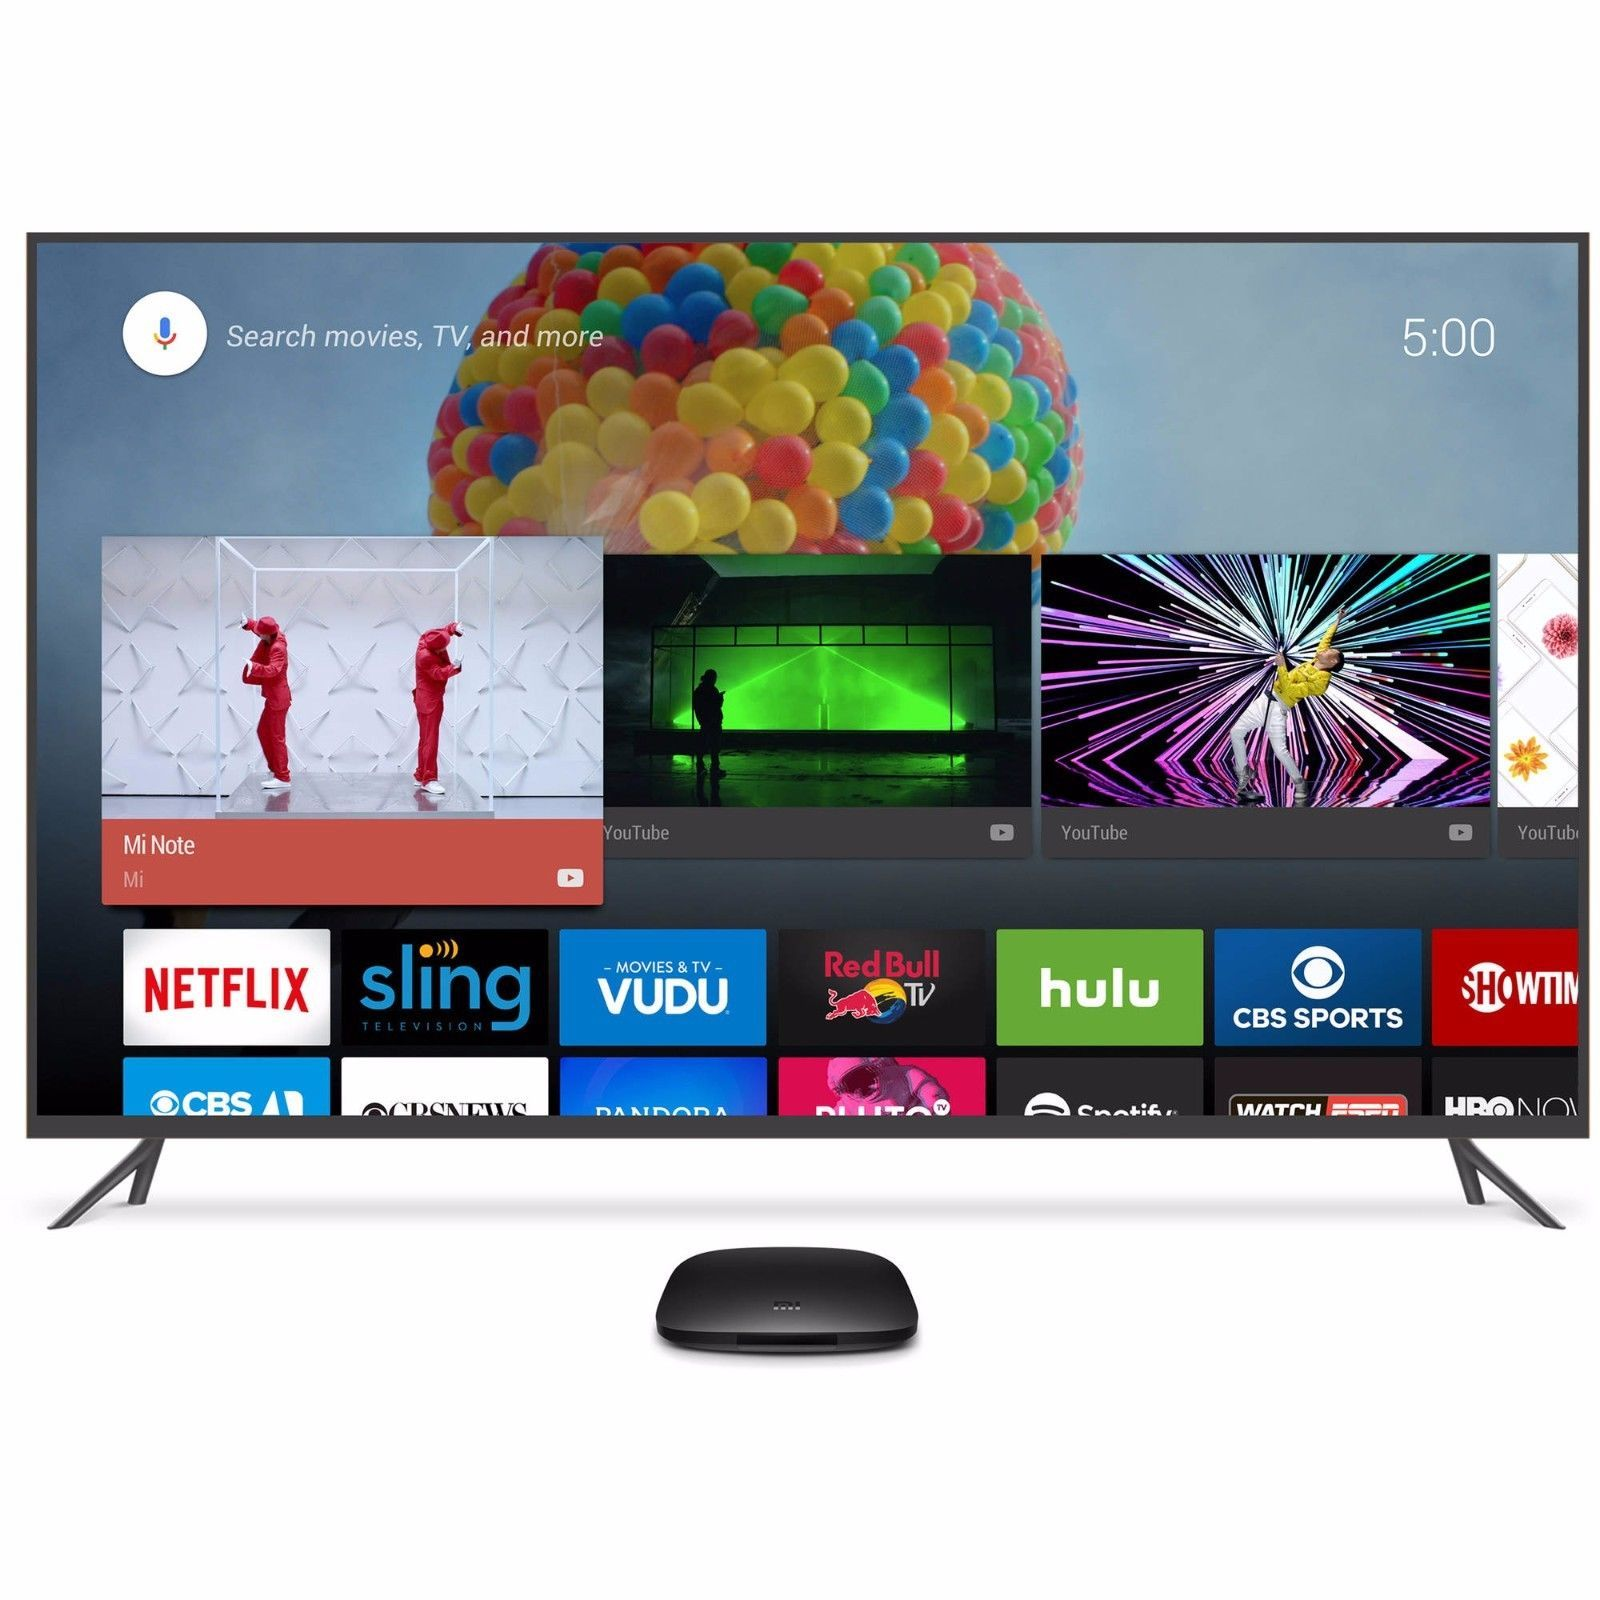 Xiaomi Mi Box Android TV 6.0 4K UHD HDR 2160p built-in Chromecast 2016 MDZ-16-AB